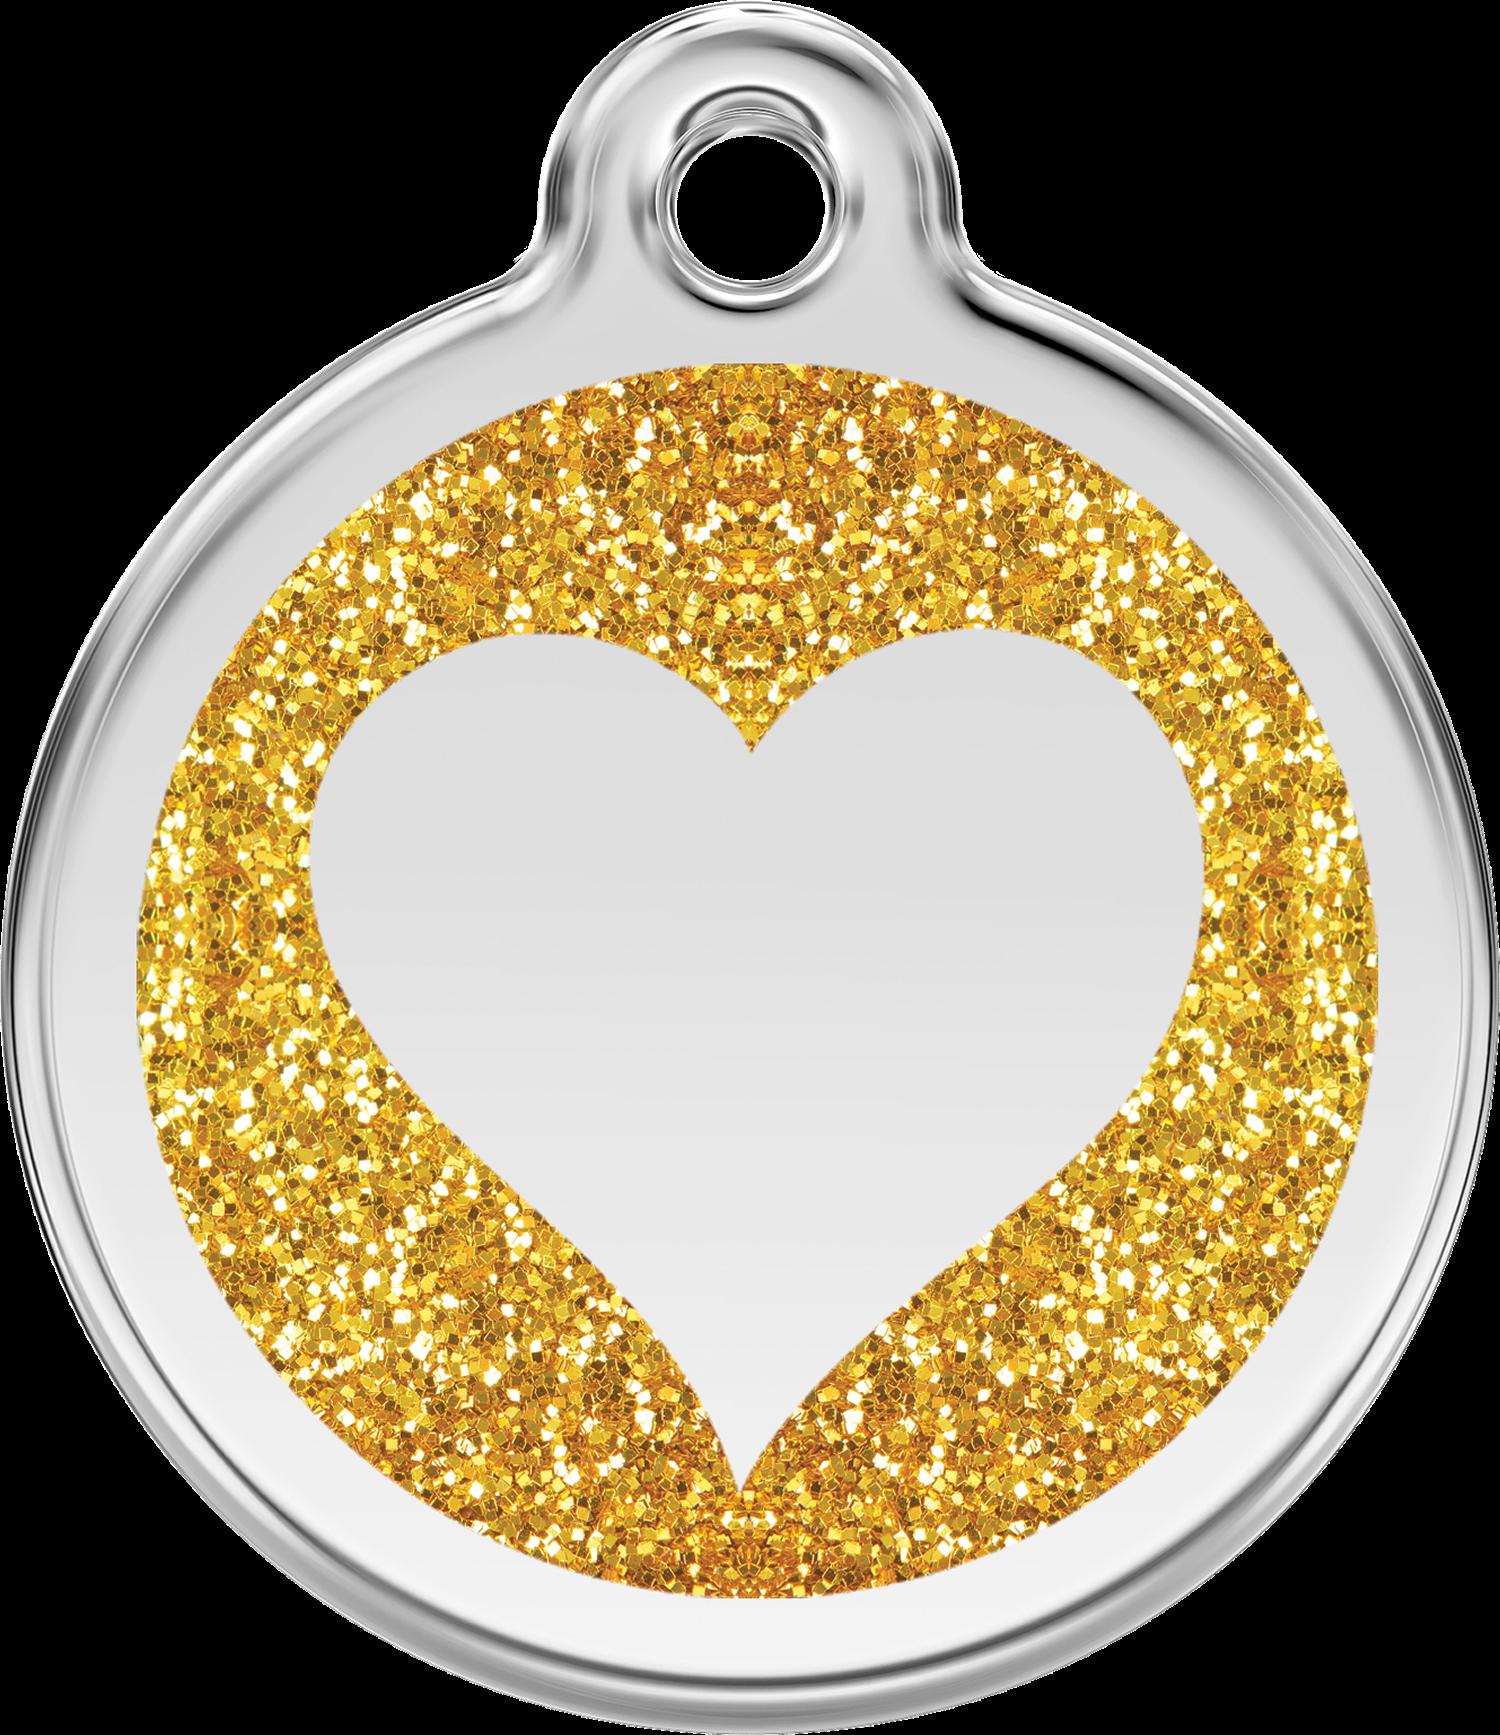 . PlusPng.com Image - Gold Glitter Heart PNG